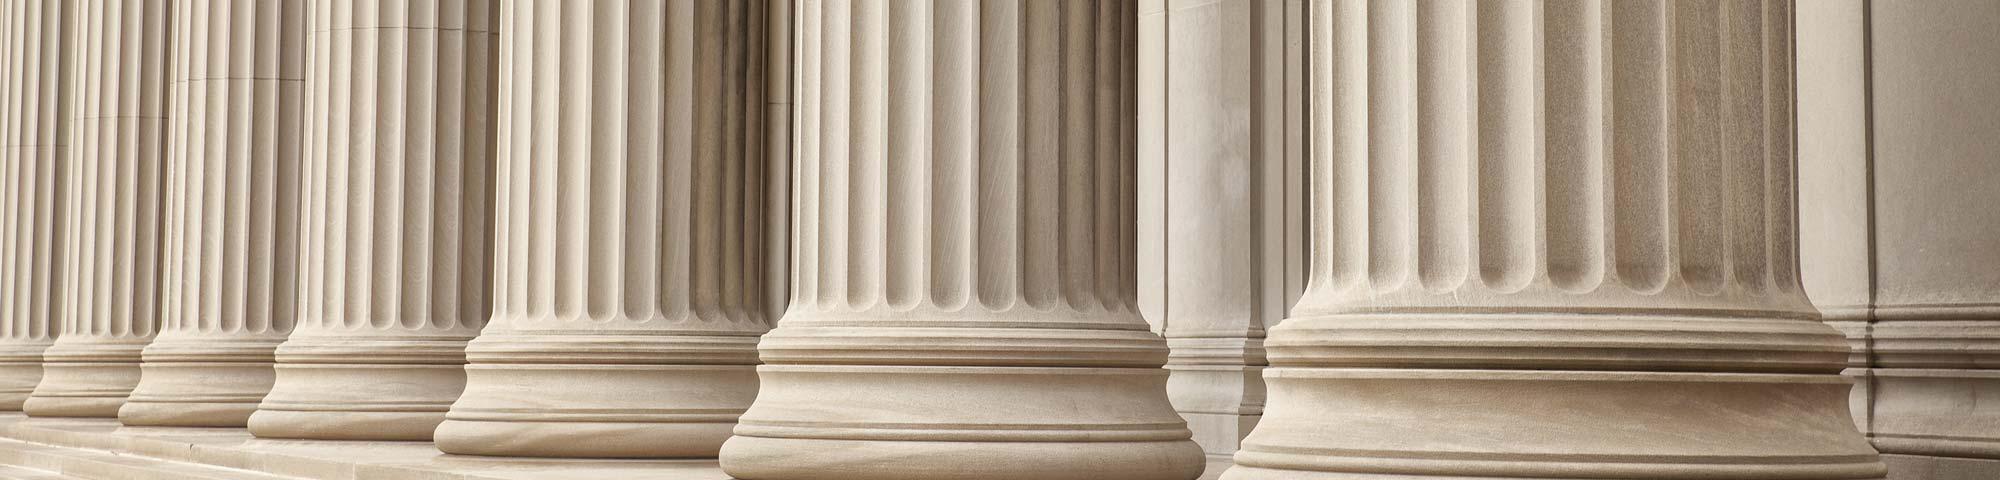 Business Litigation page headline